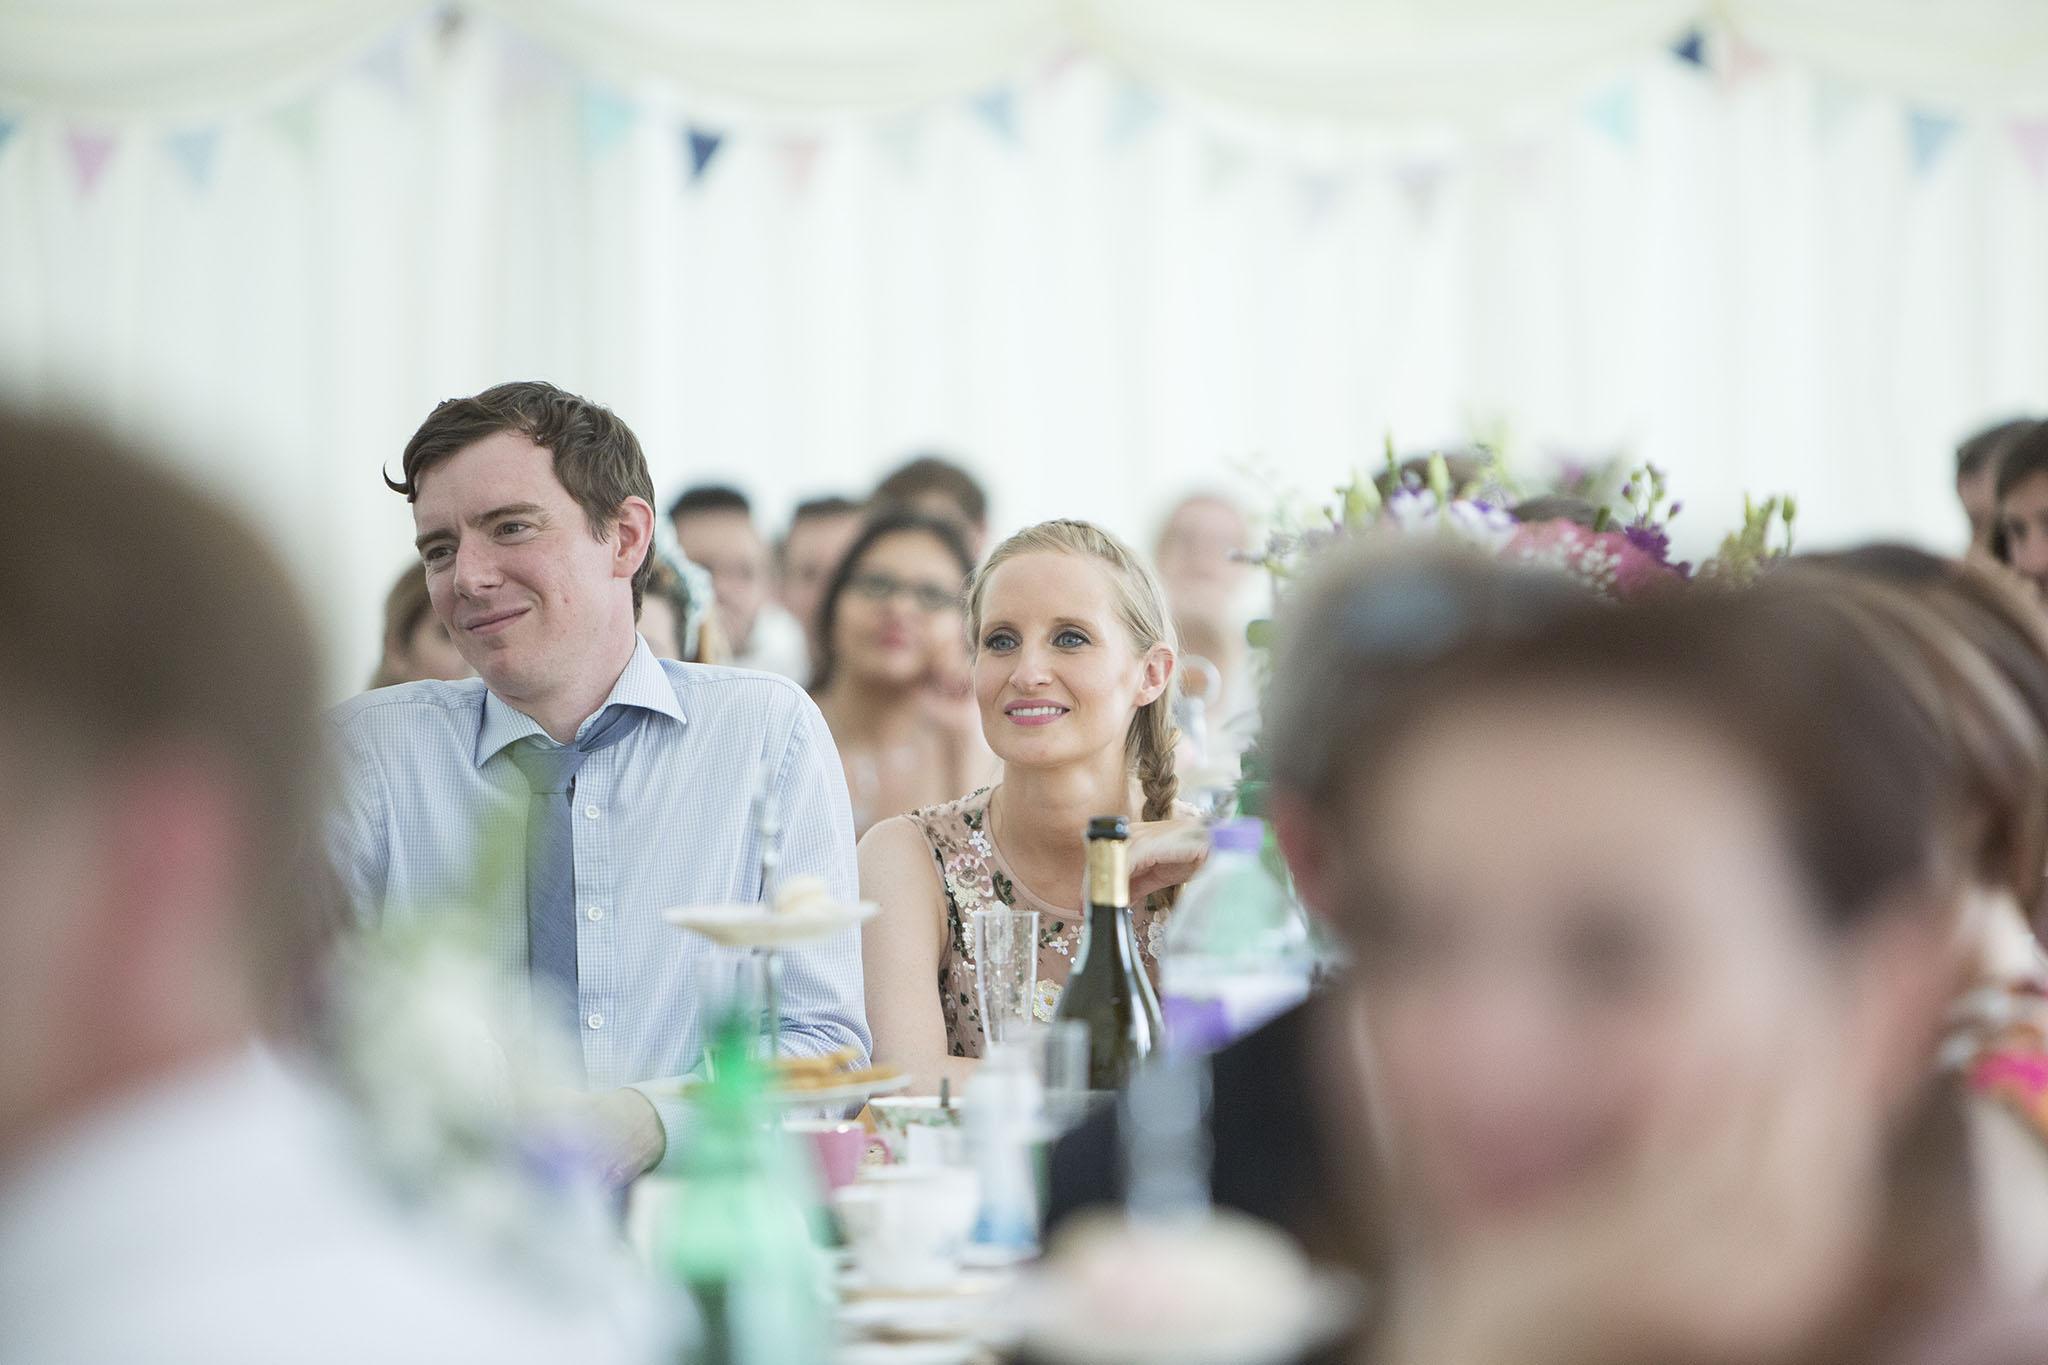 elizabethgphotography_kingslangley_hertfordshire_fineart_wedding_pottersbar_matt_katie_pegg_42.jpg